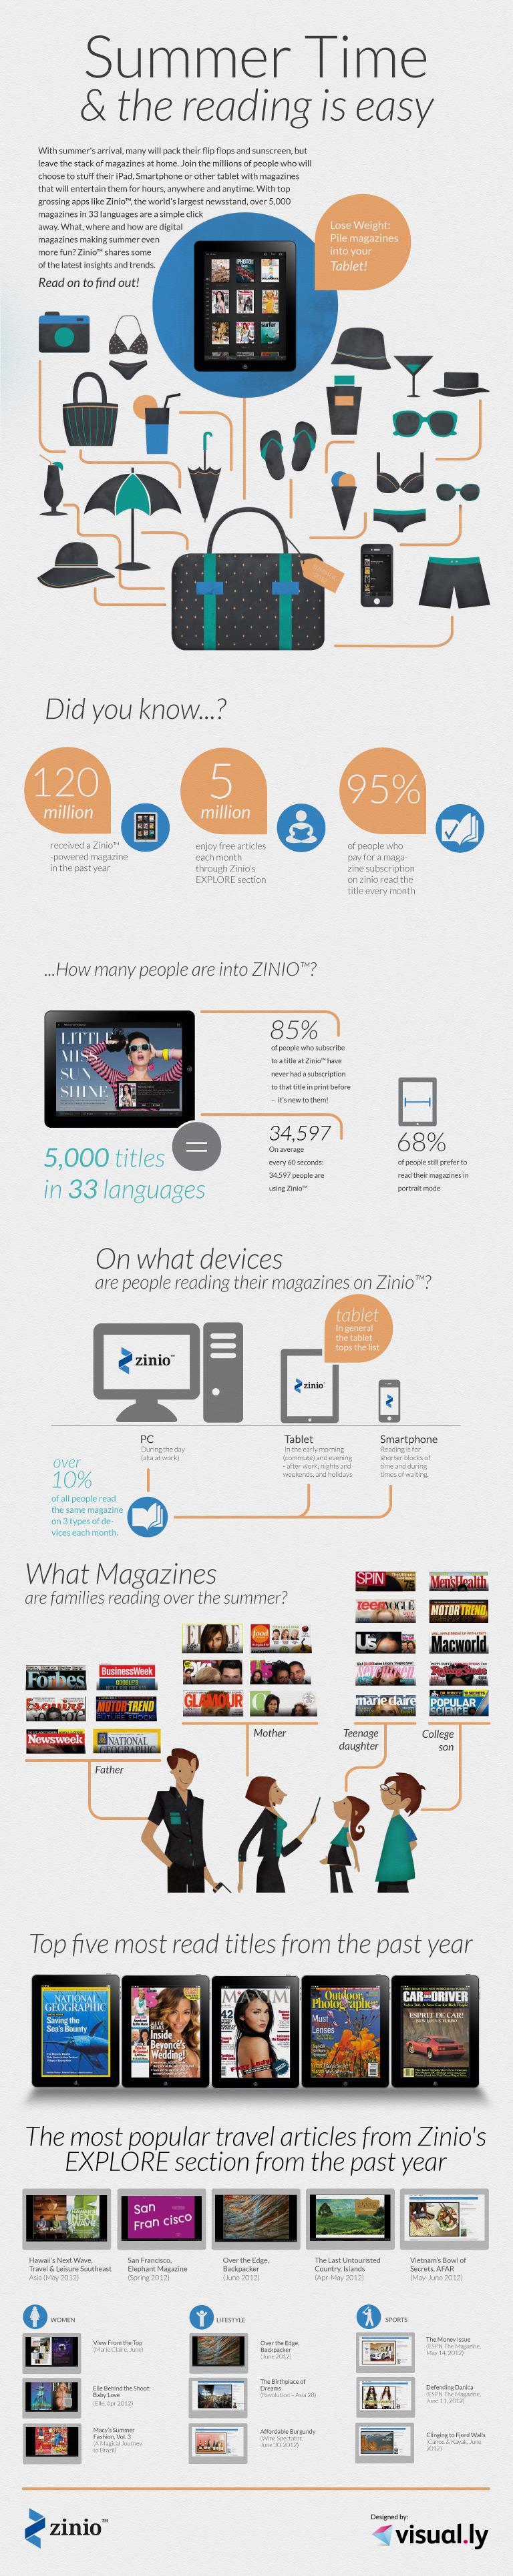 Zinio digital magazine data